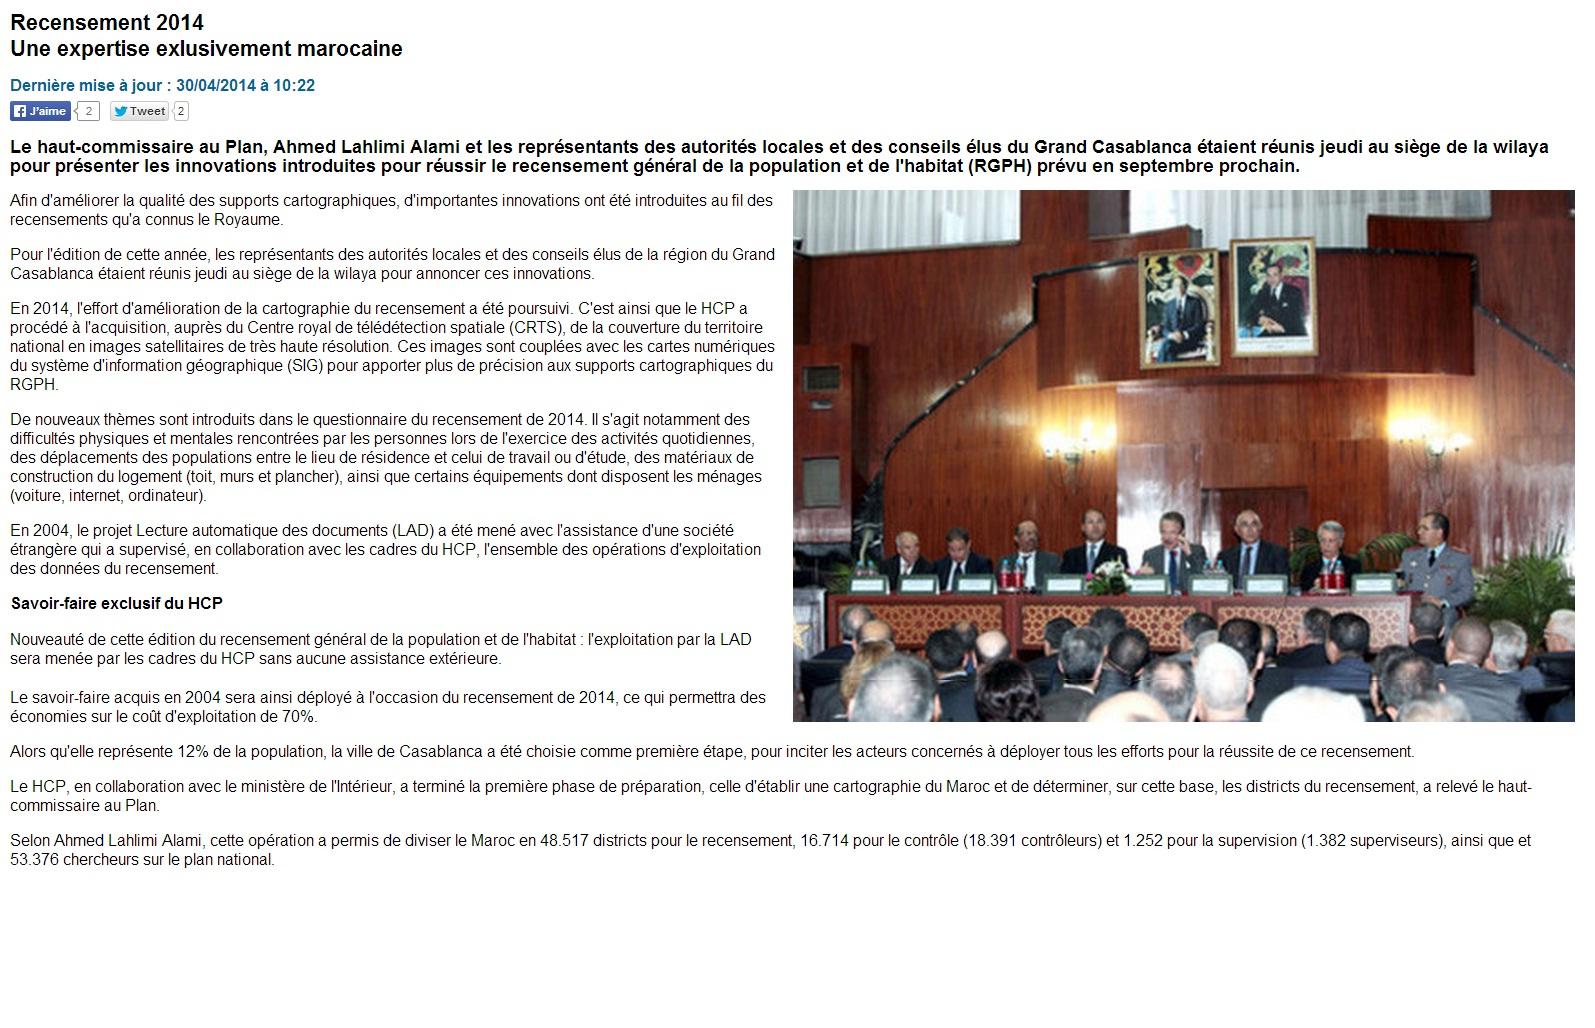 Recensement 2014: Une expertise exclusivement marocaine